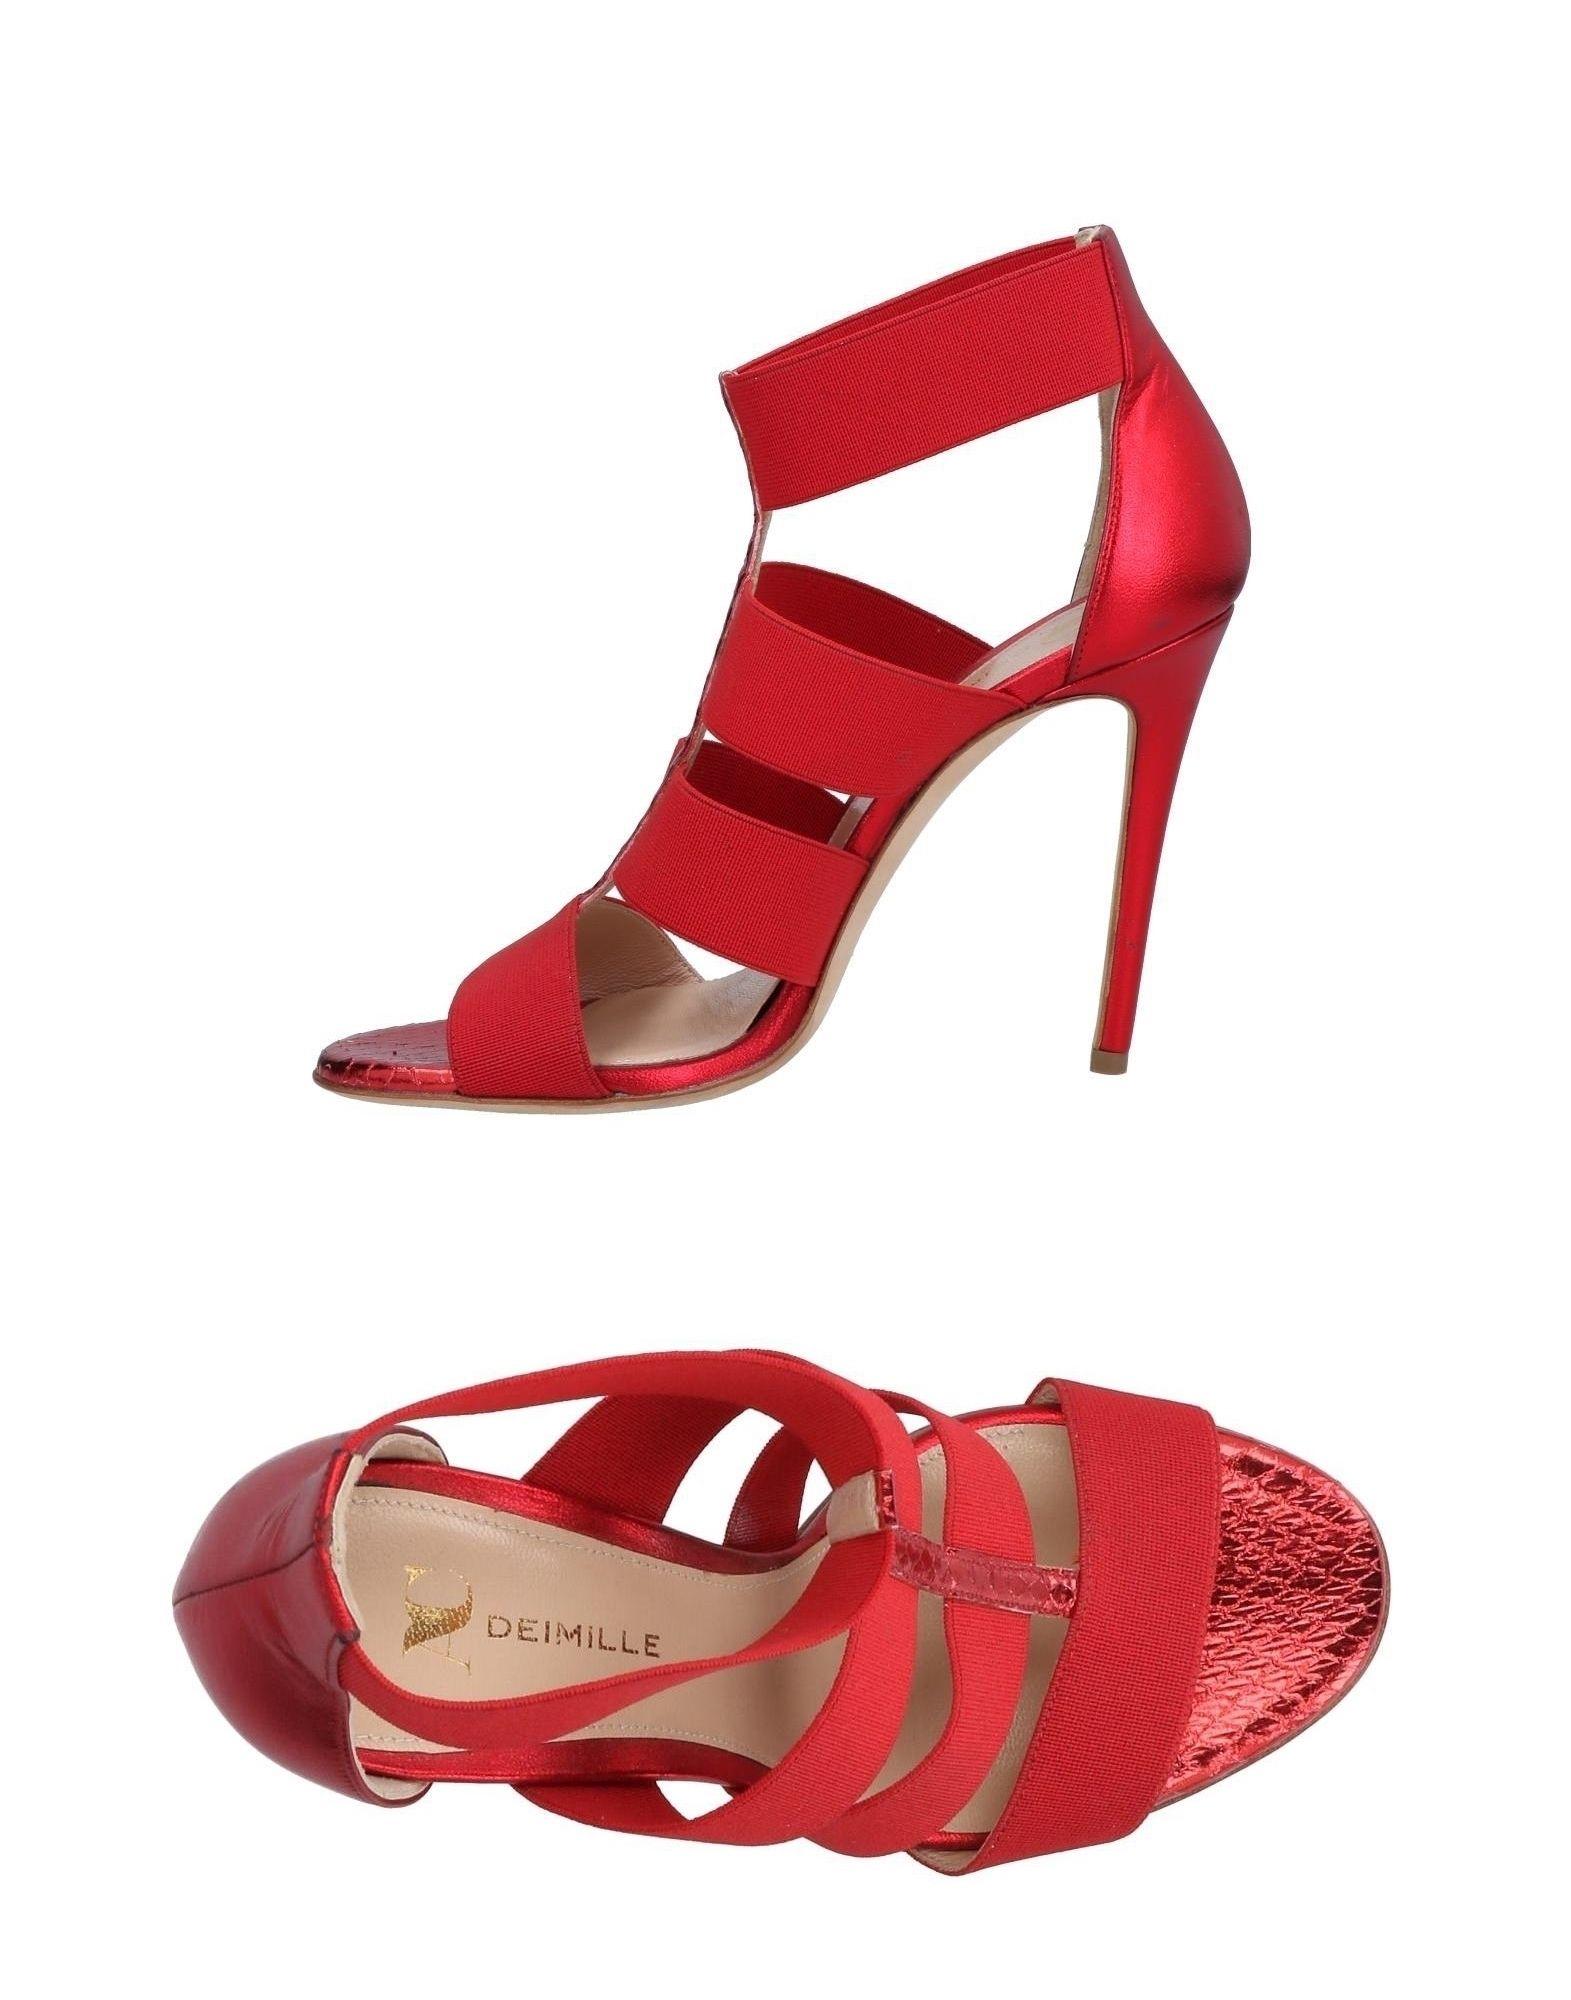 Deimille Sandals Sandals - Women Deimille Sandals Deimille online on  United Kingdom - 11488104GH 381c20